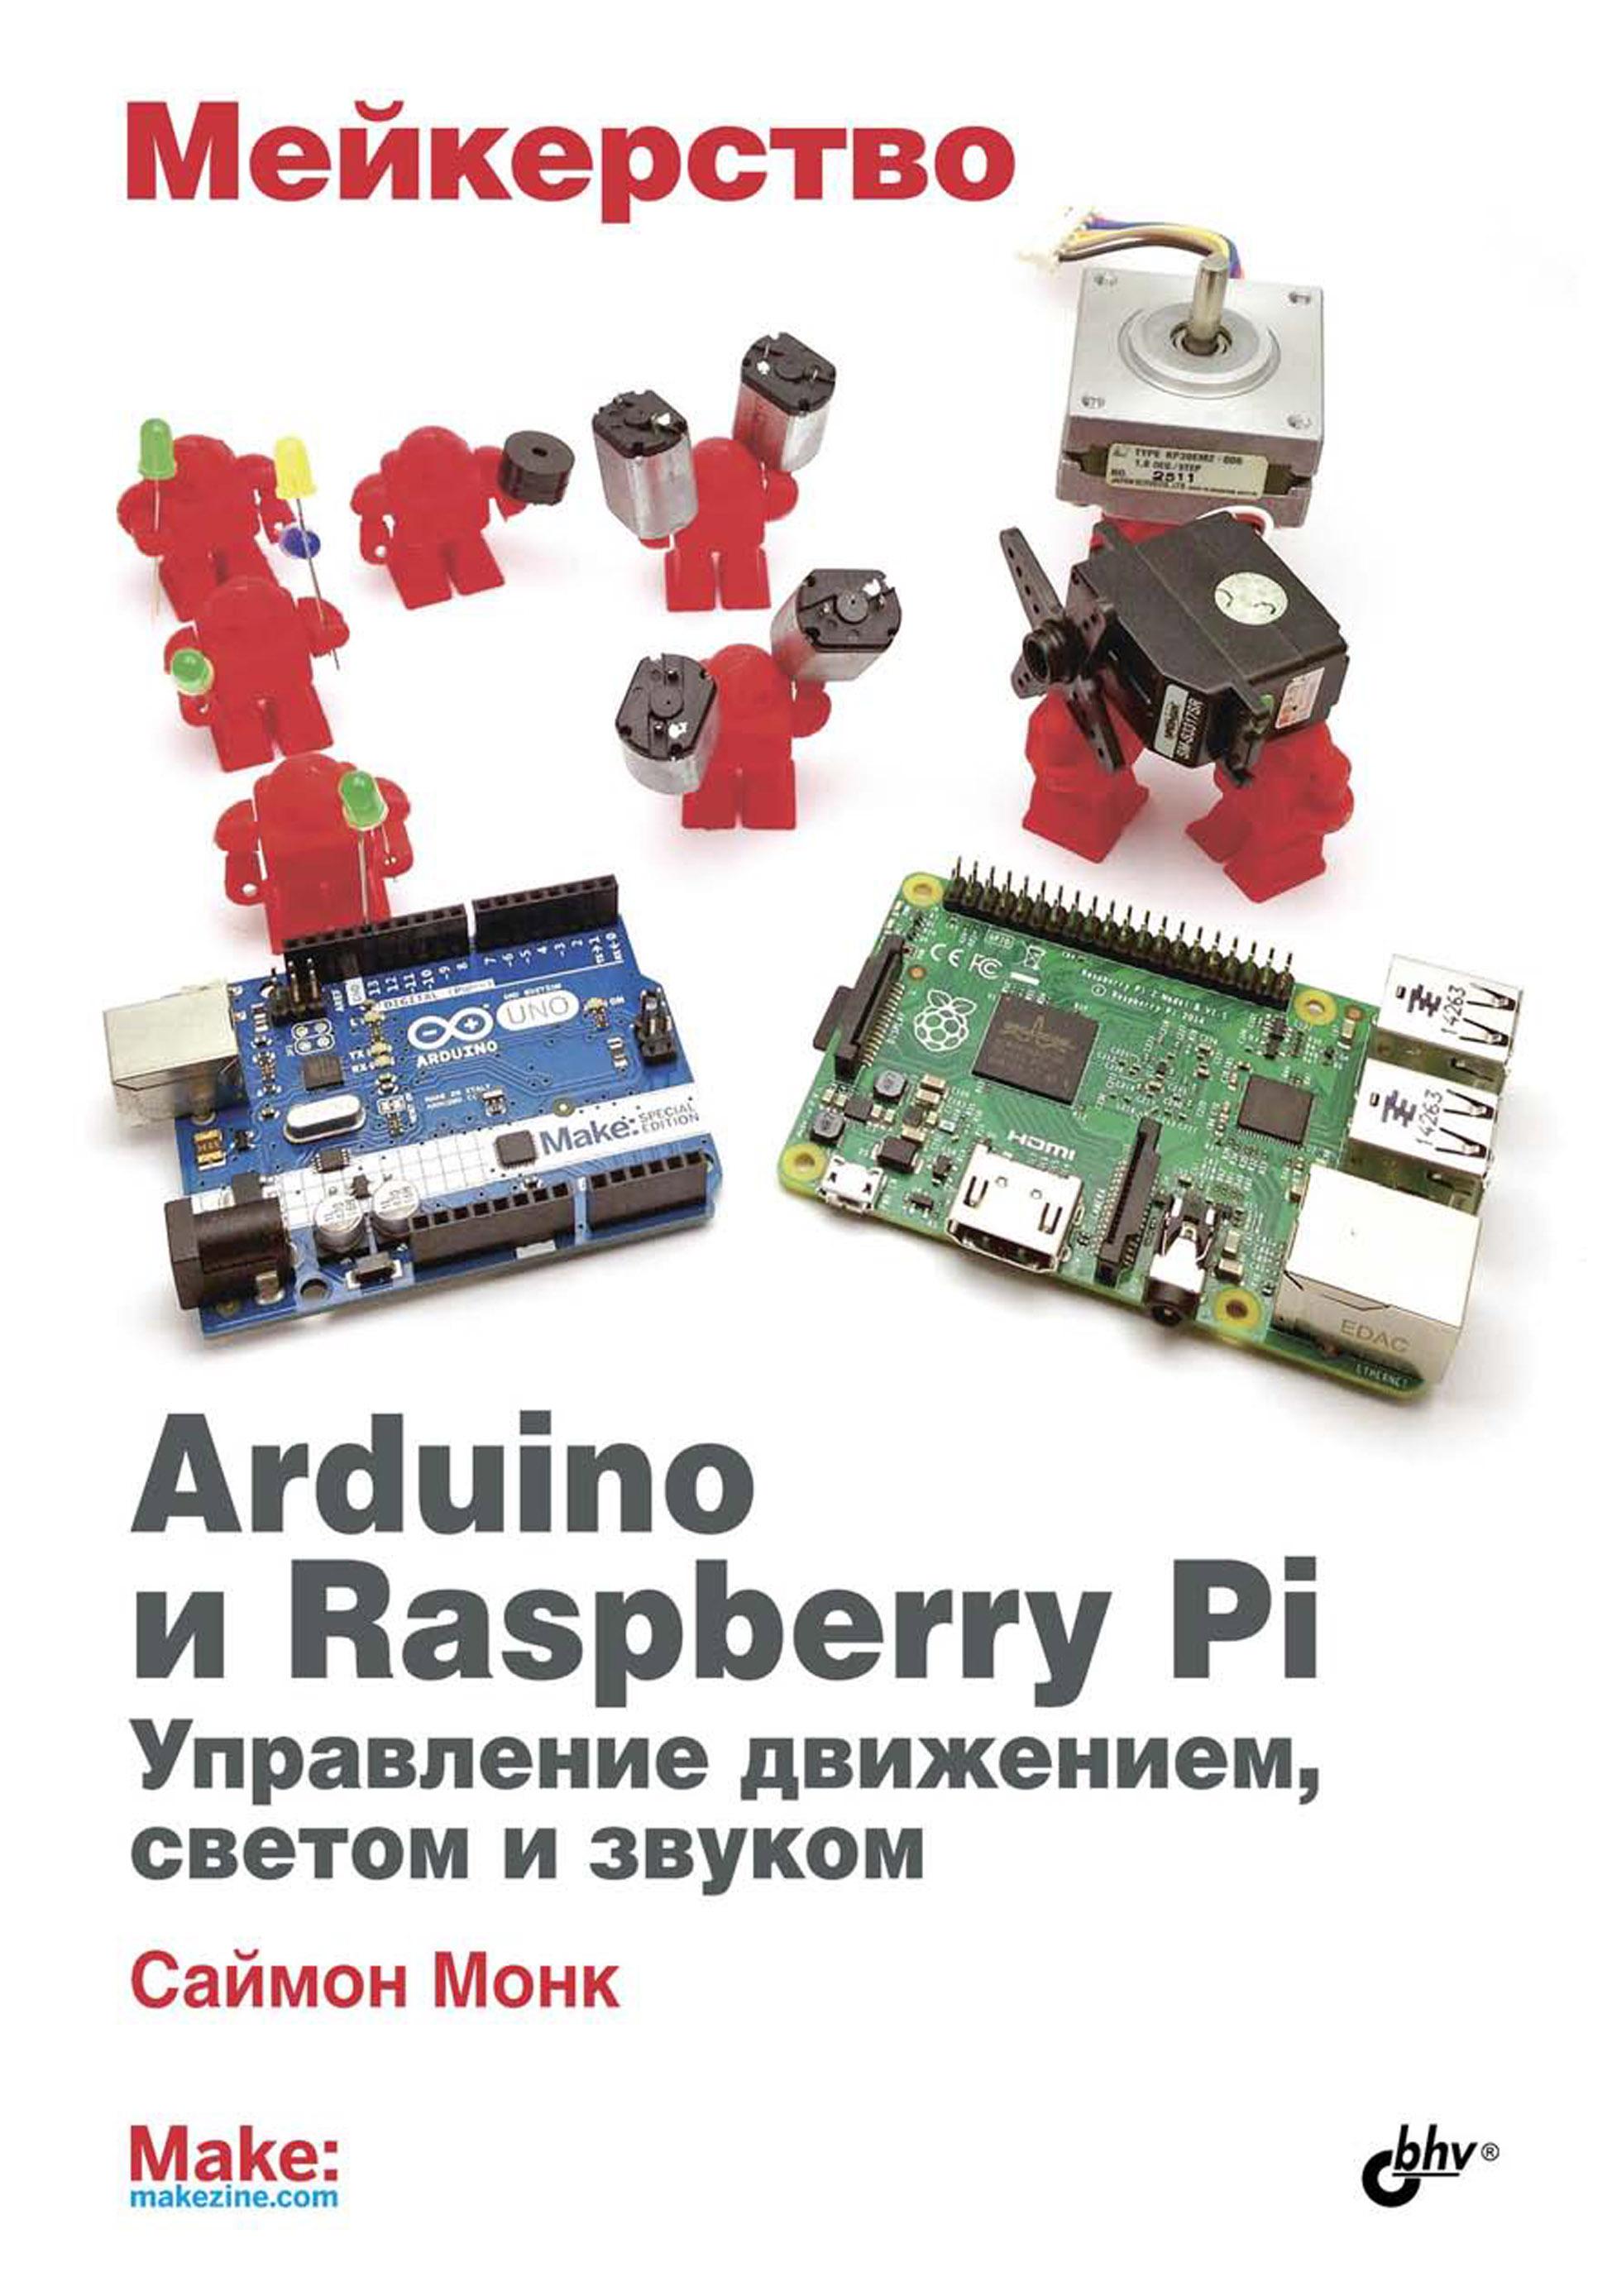 Саймон Монк Мейкерство. Arduino и Raspberry Pi. Управление движением, светом и звуком new direct selling raspberry pie 3 generation metal shell raspberry pi 3 aluminium alloy box heat radiation protective shell